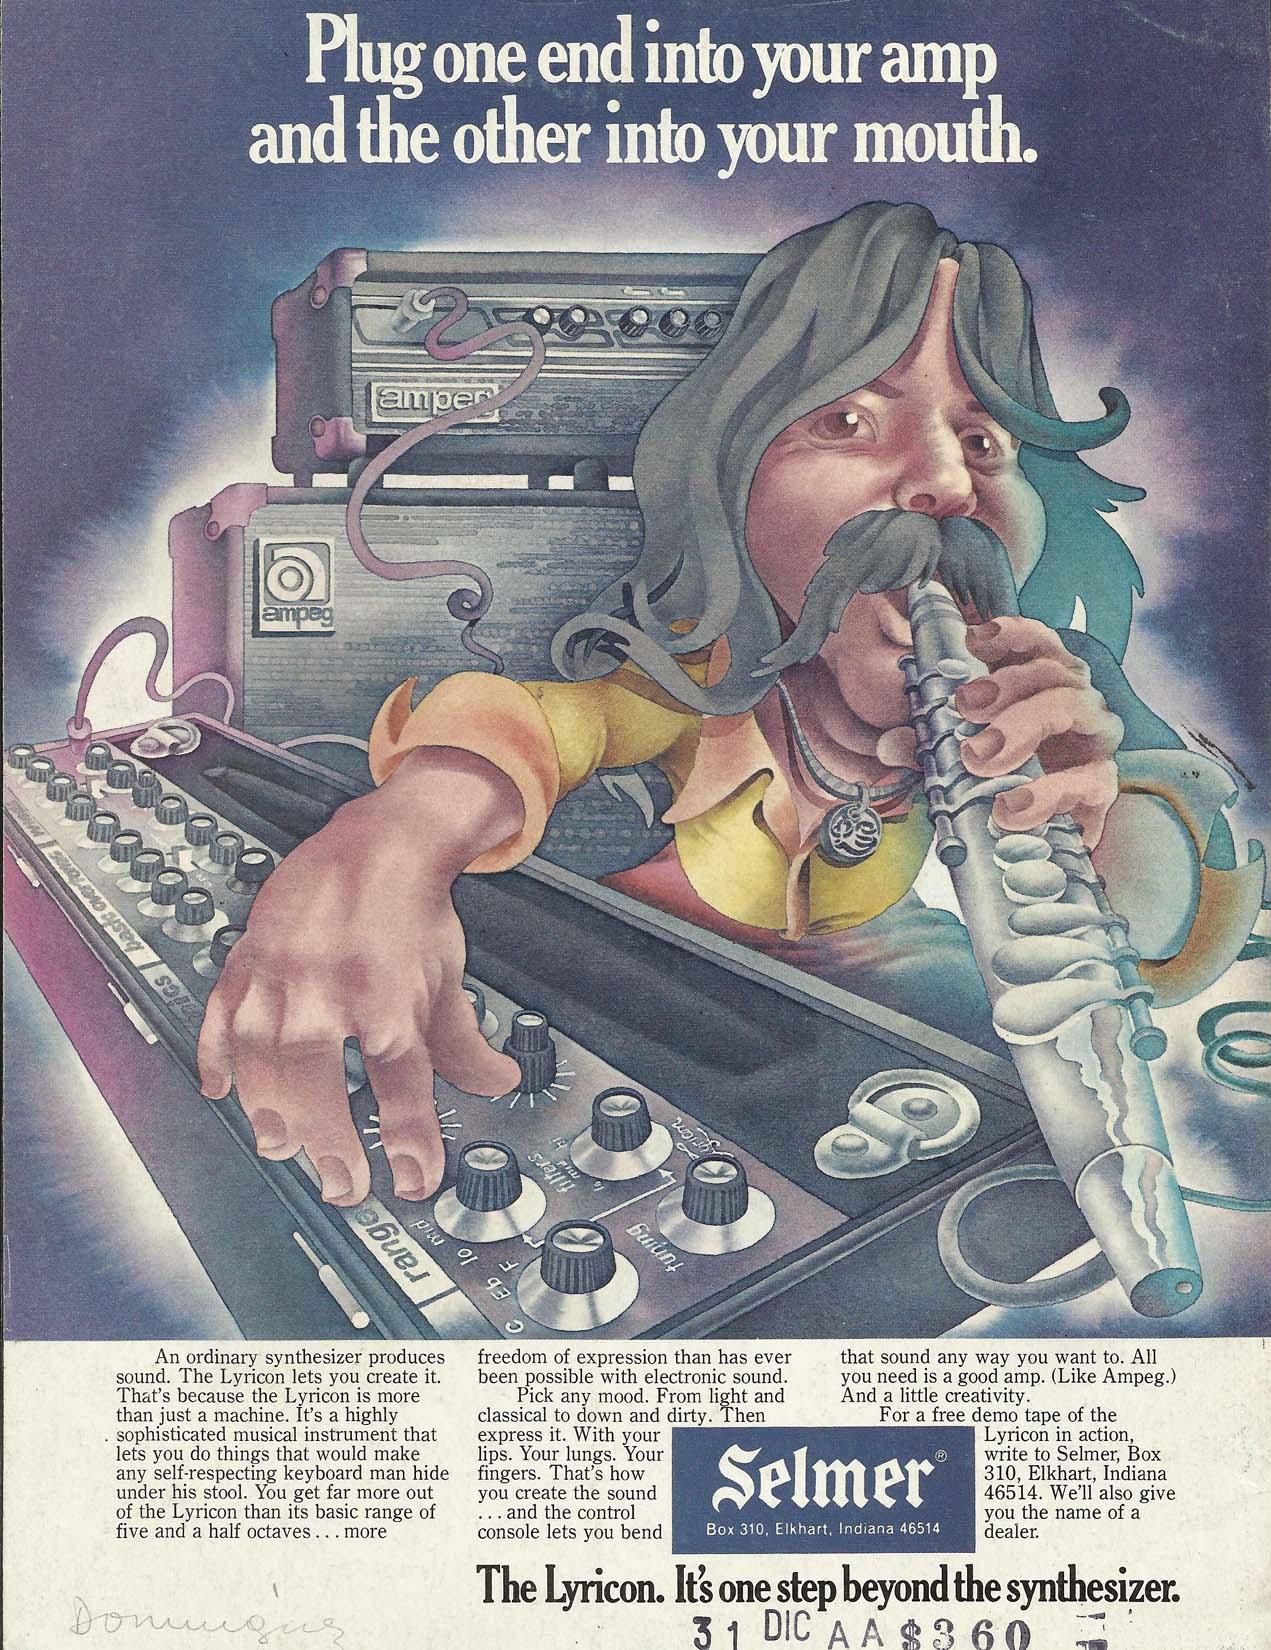 1975 Lyricon Ad